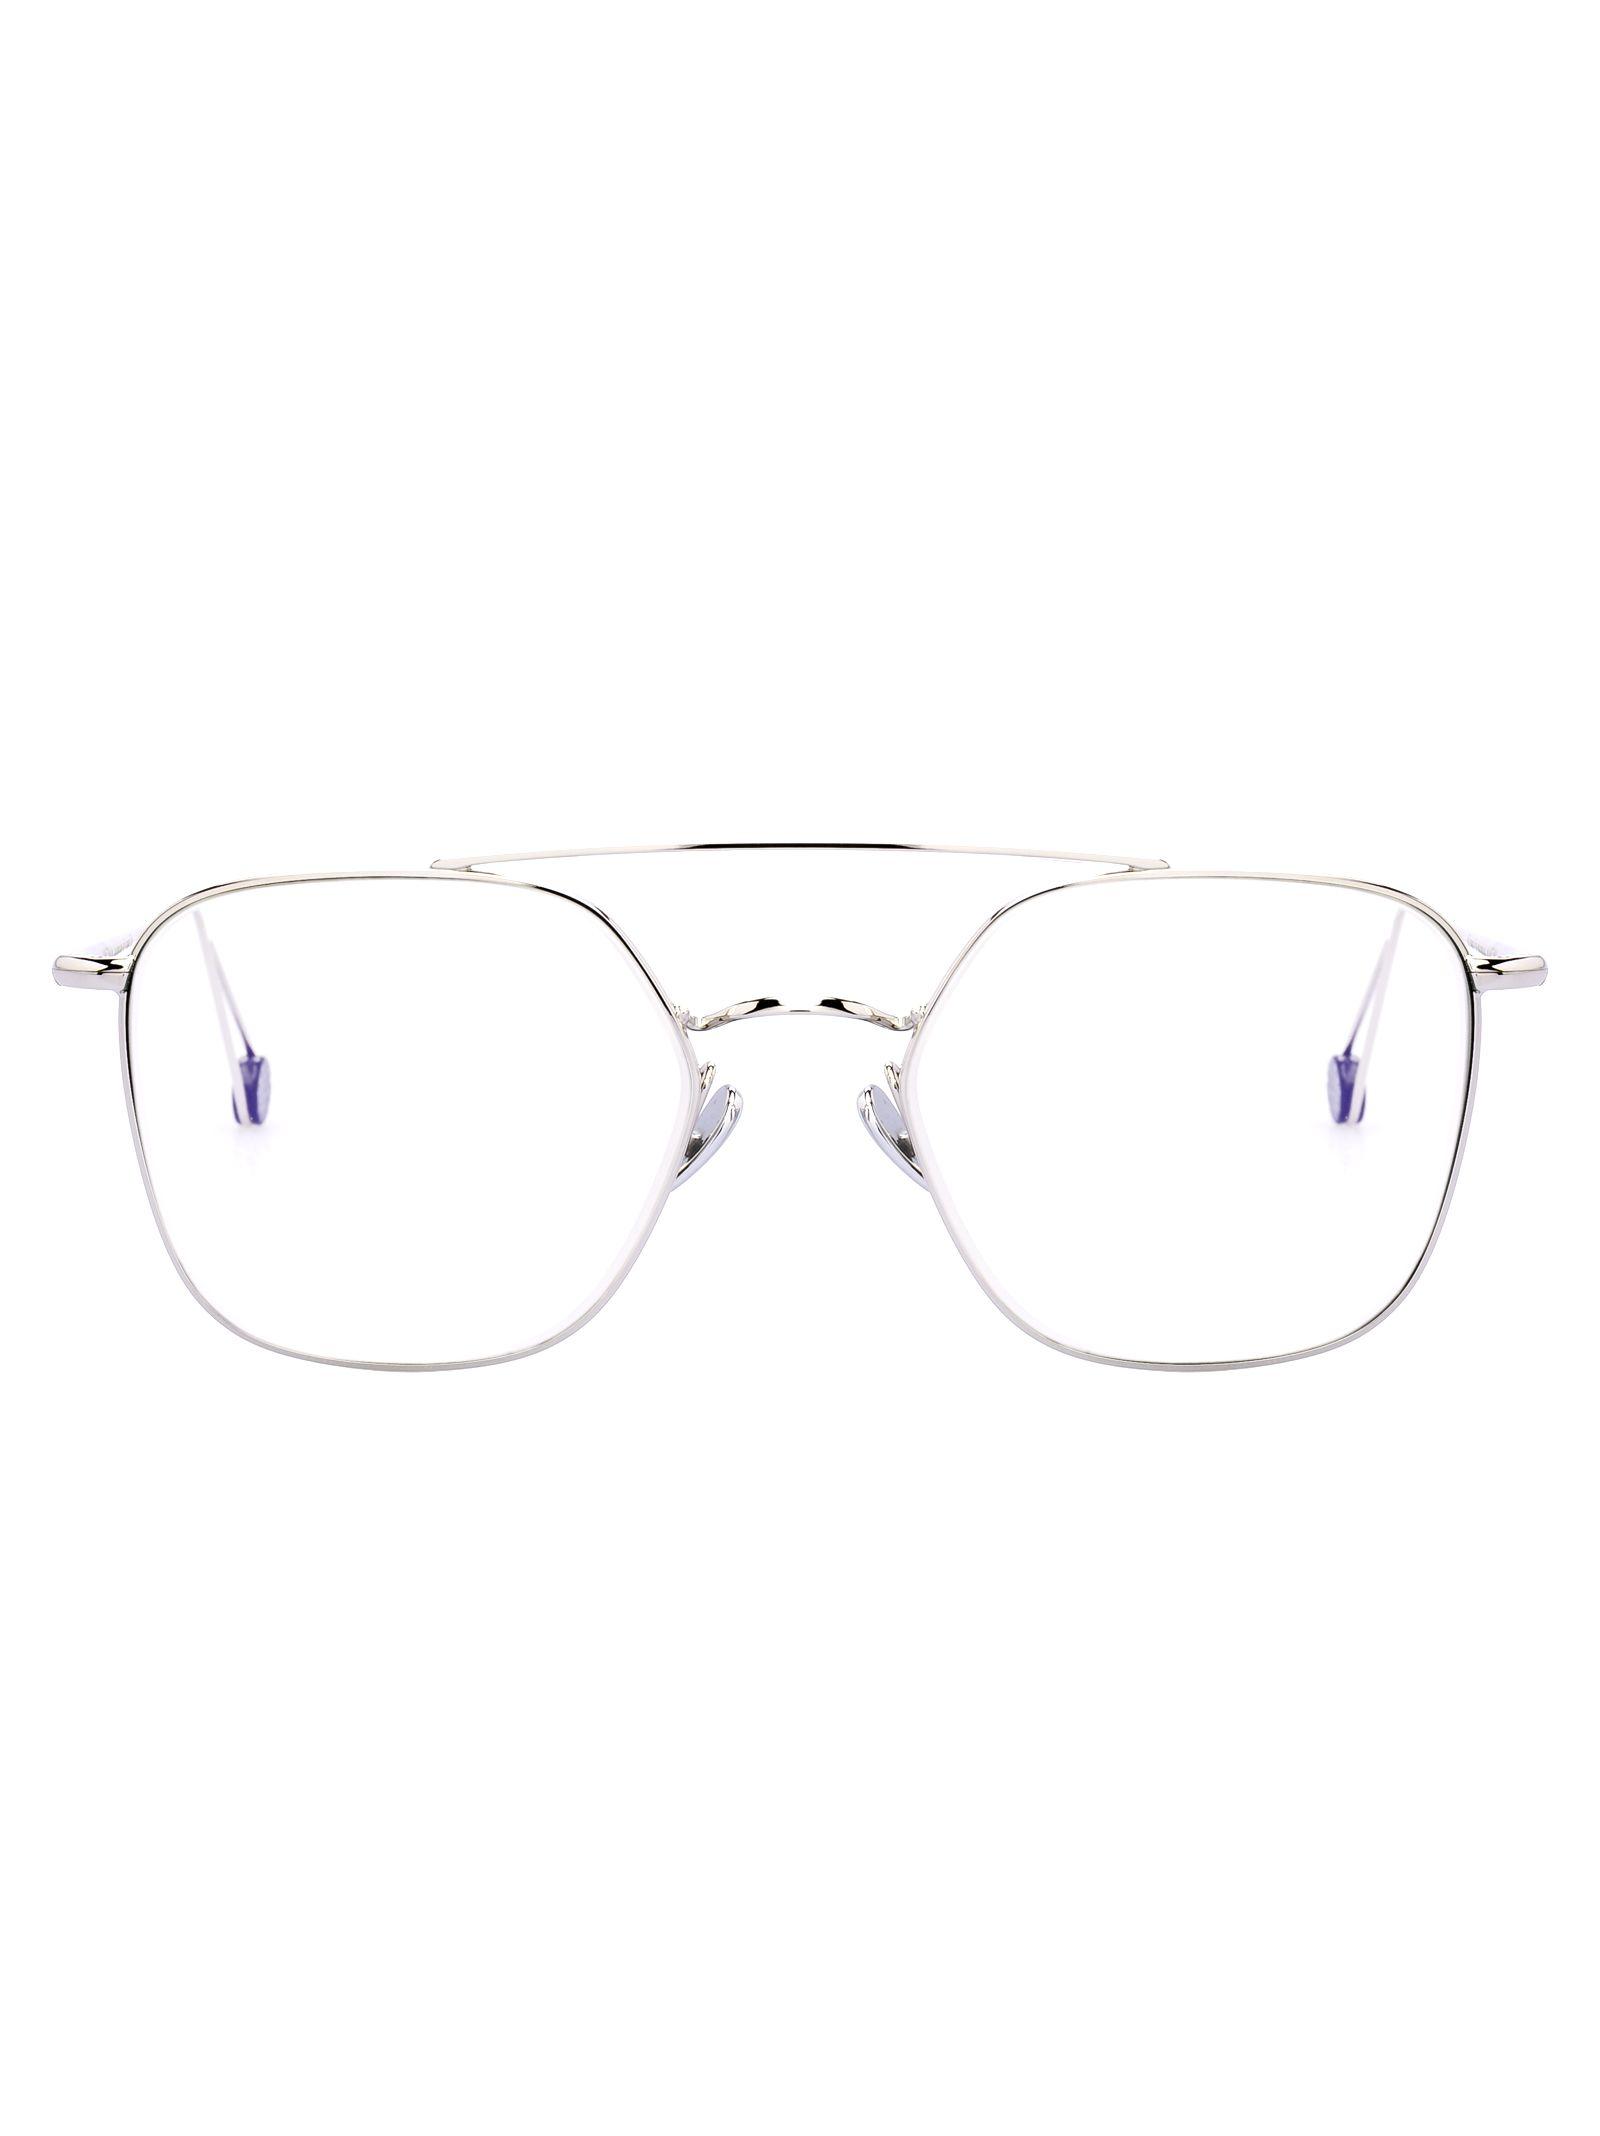 Ahlem Concorde Glasses, White Gold